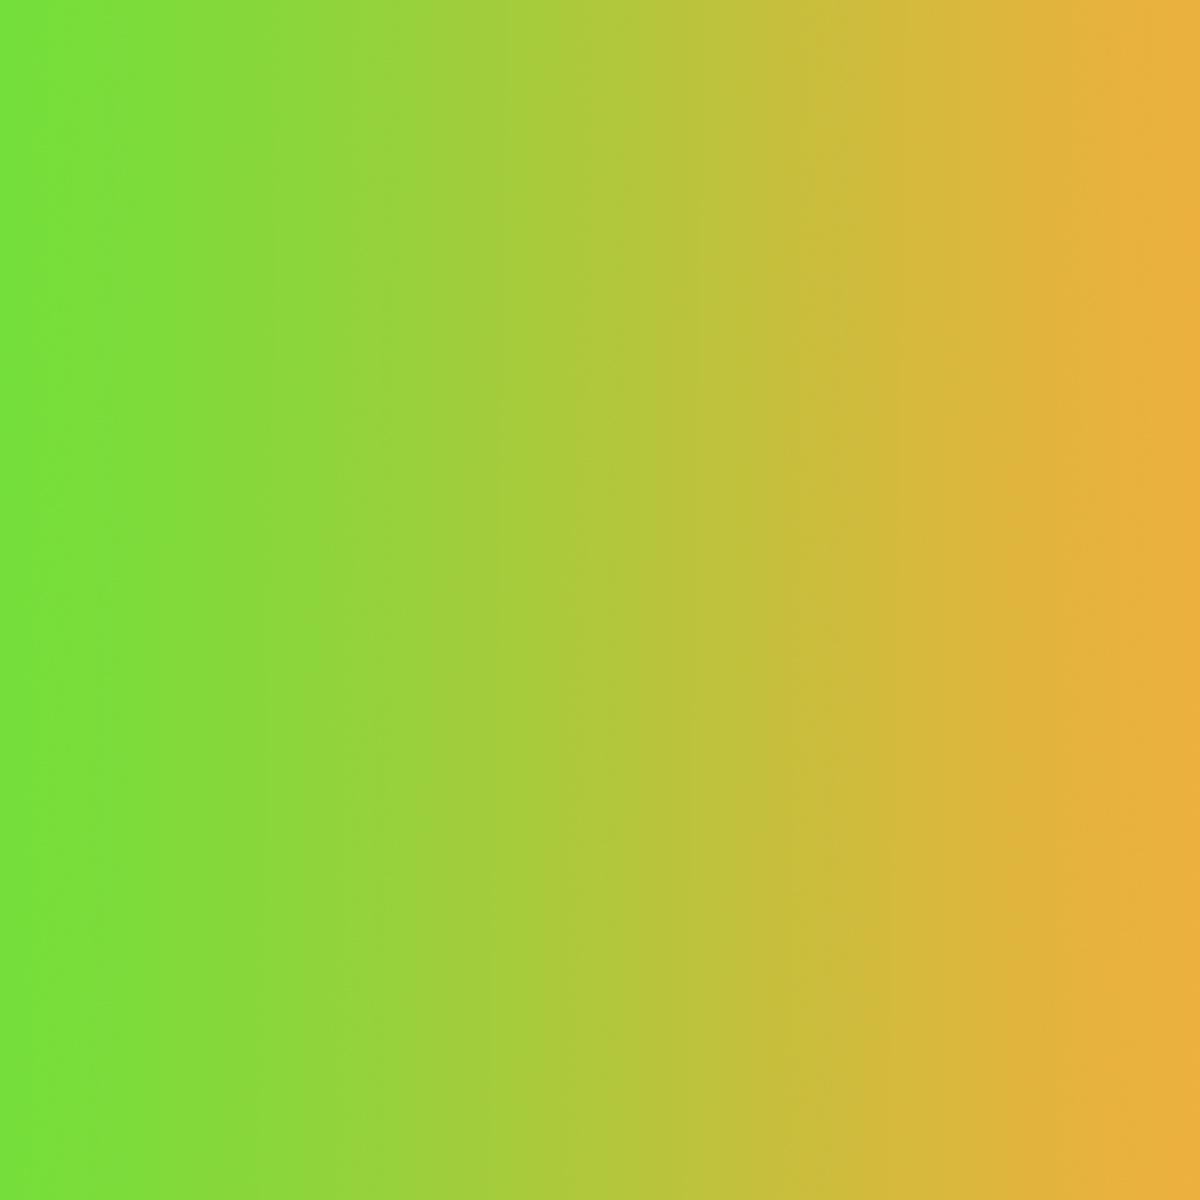 green-orange.jpg